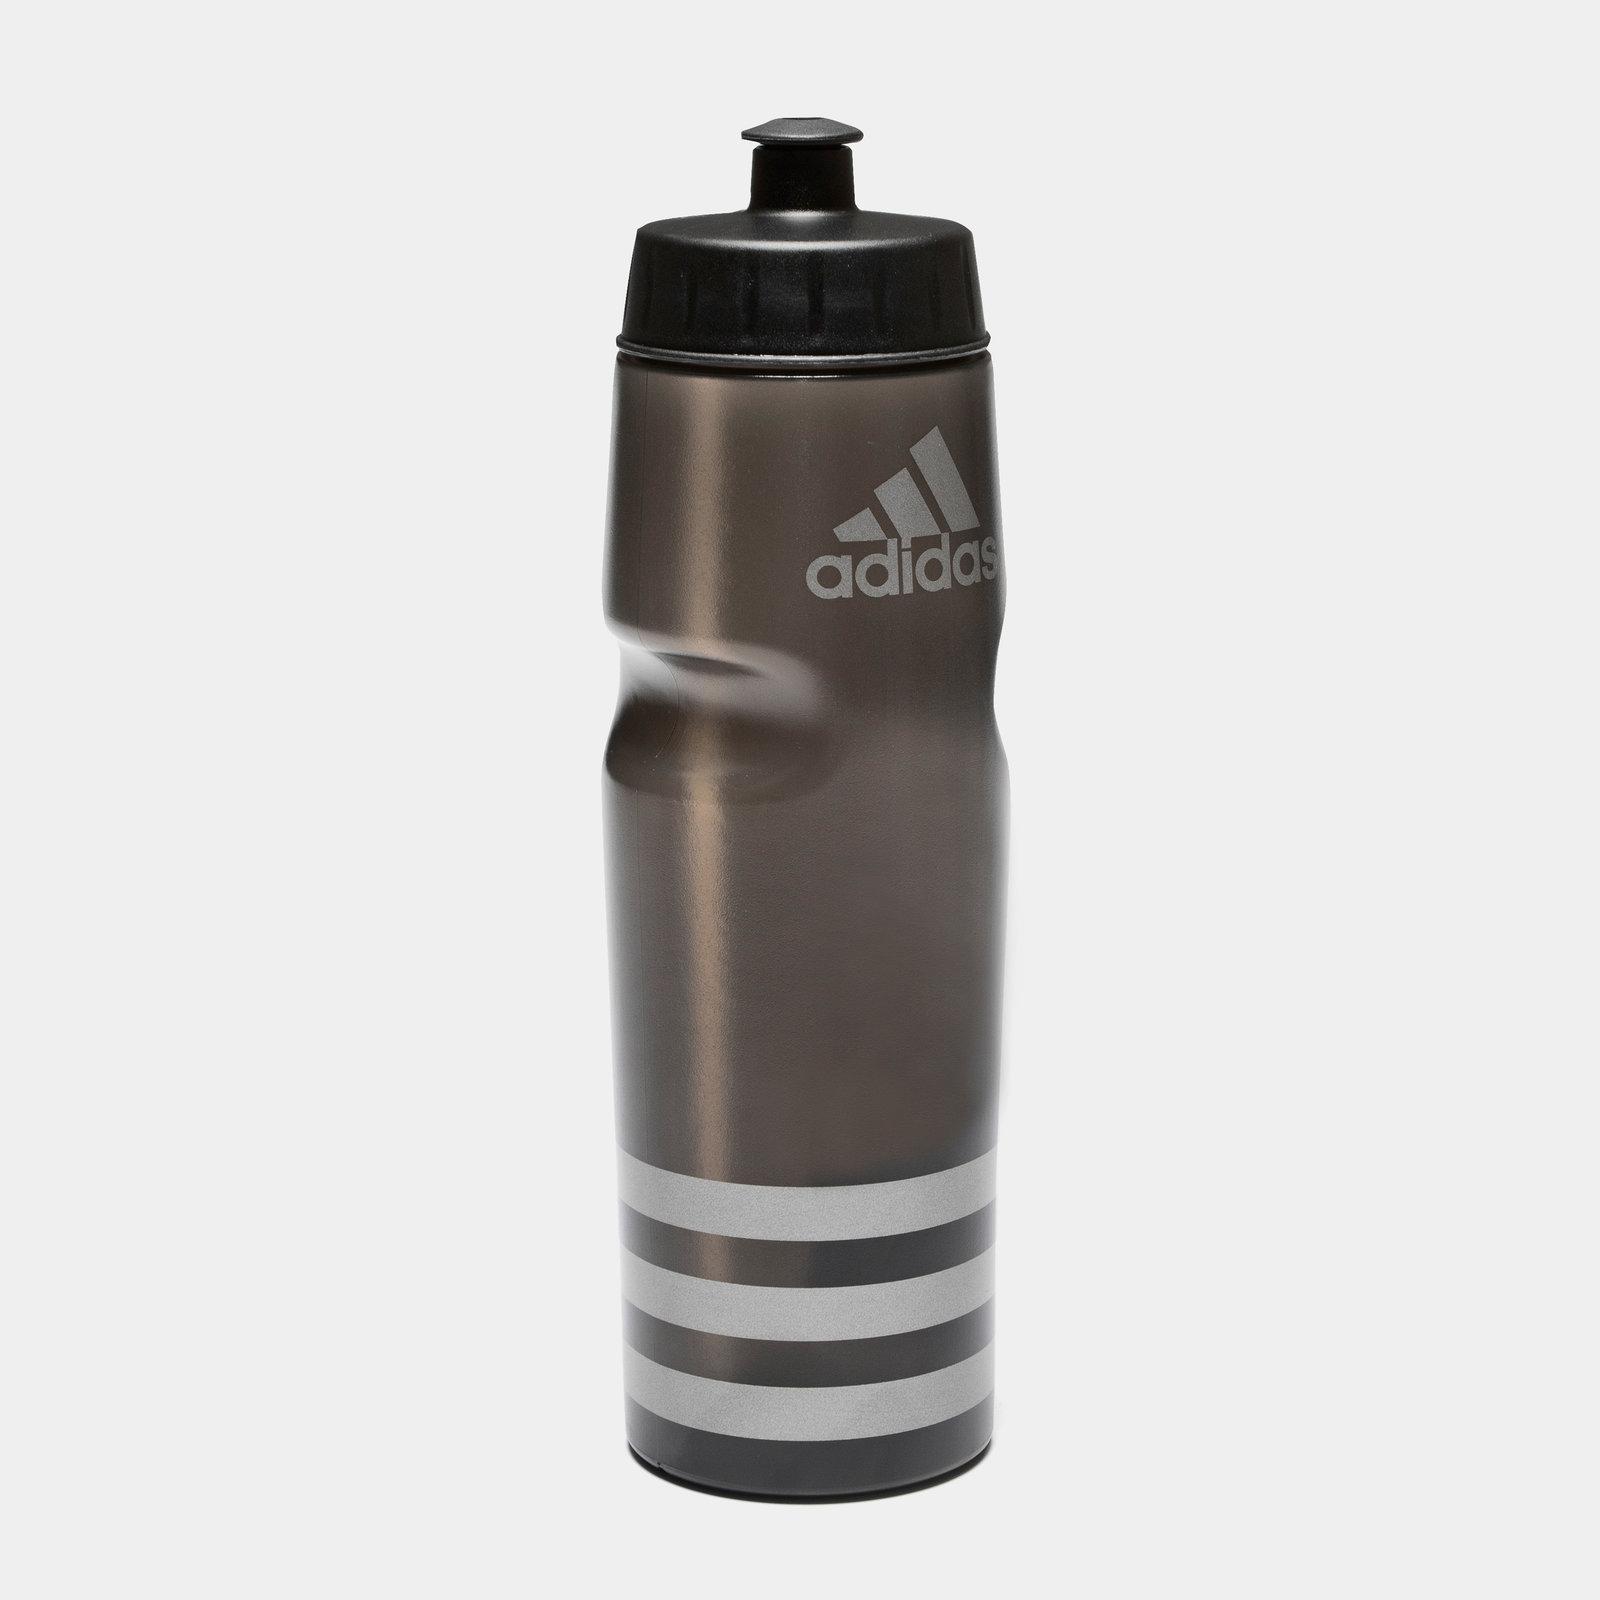 Image of 3 Stripe 750ml Performance Water Bottle